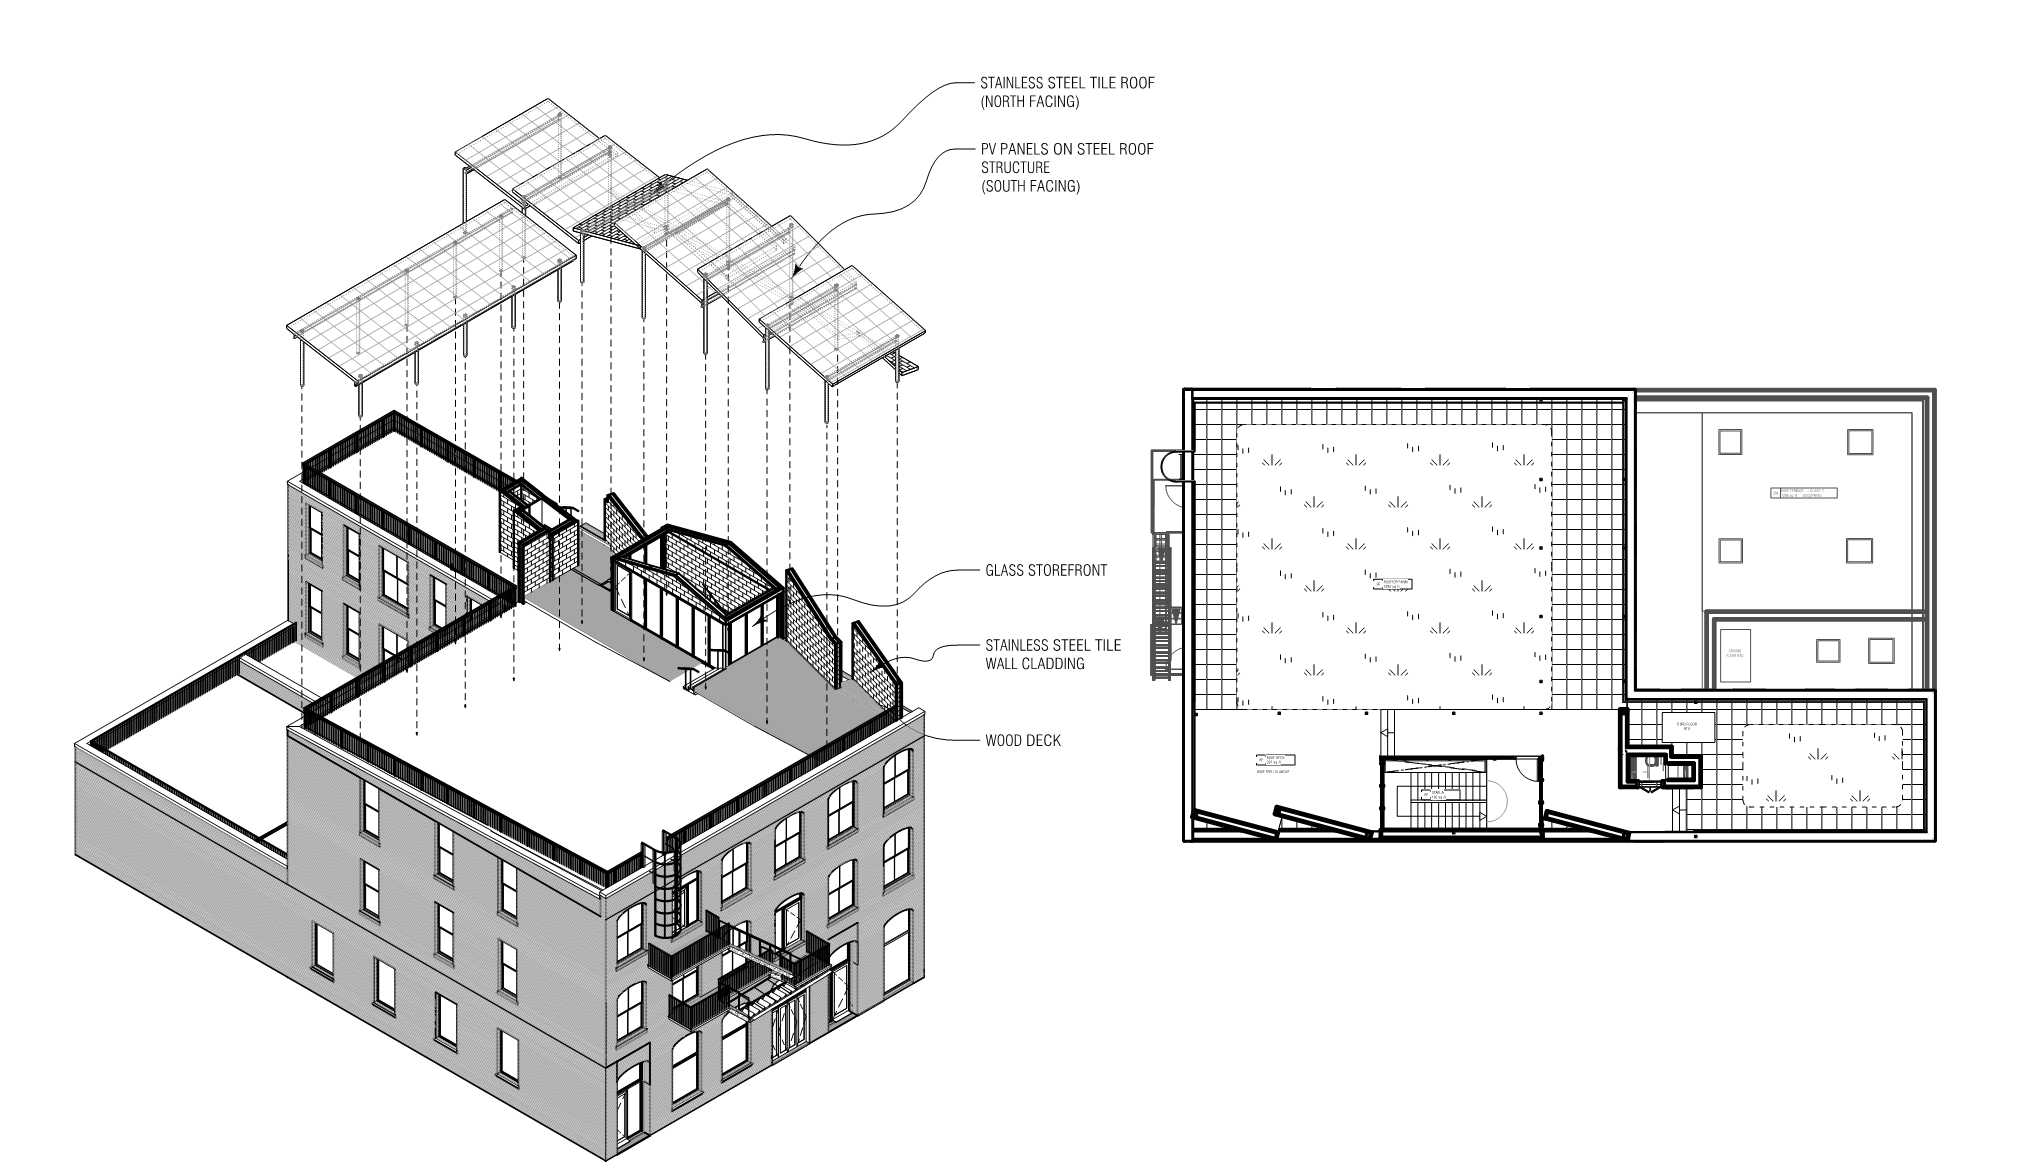 150719 Gowanus Rooftop Concept.png